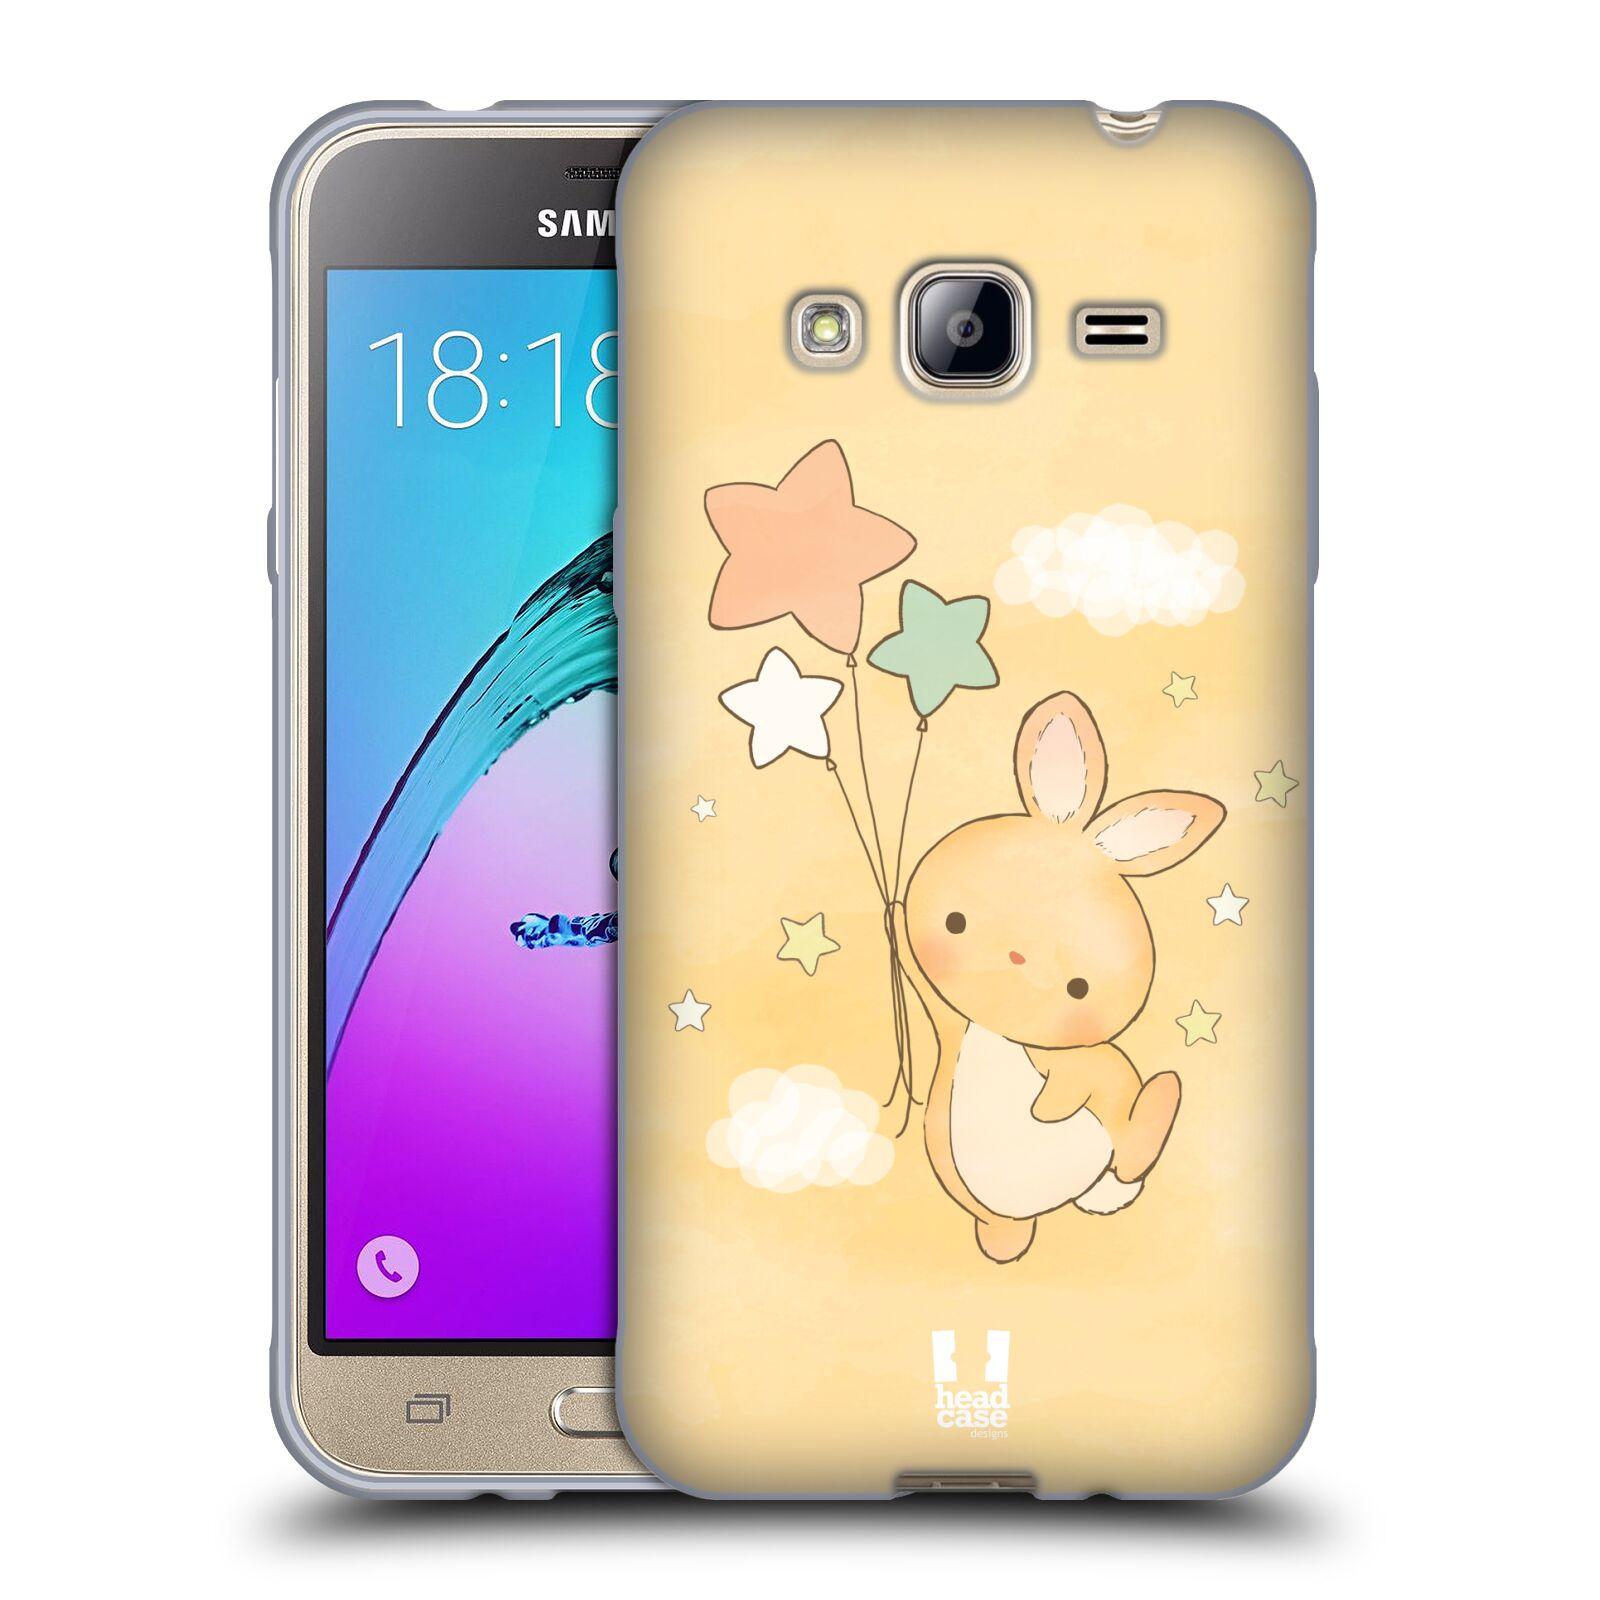 HEAD CASE silikonový obal na mobil Samsung Galaxy J3, J3 2016 vzor králíček a hvězdy žlutá